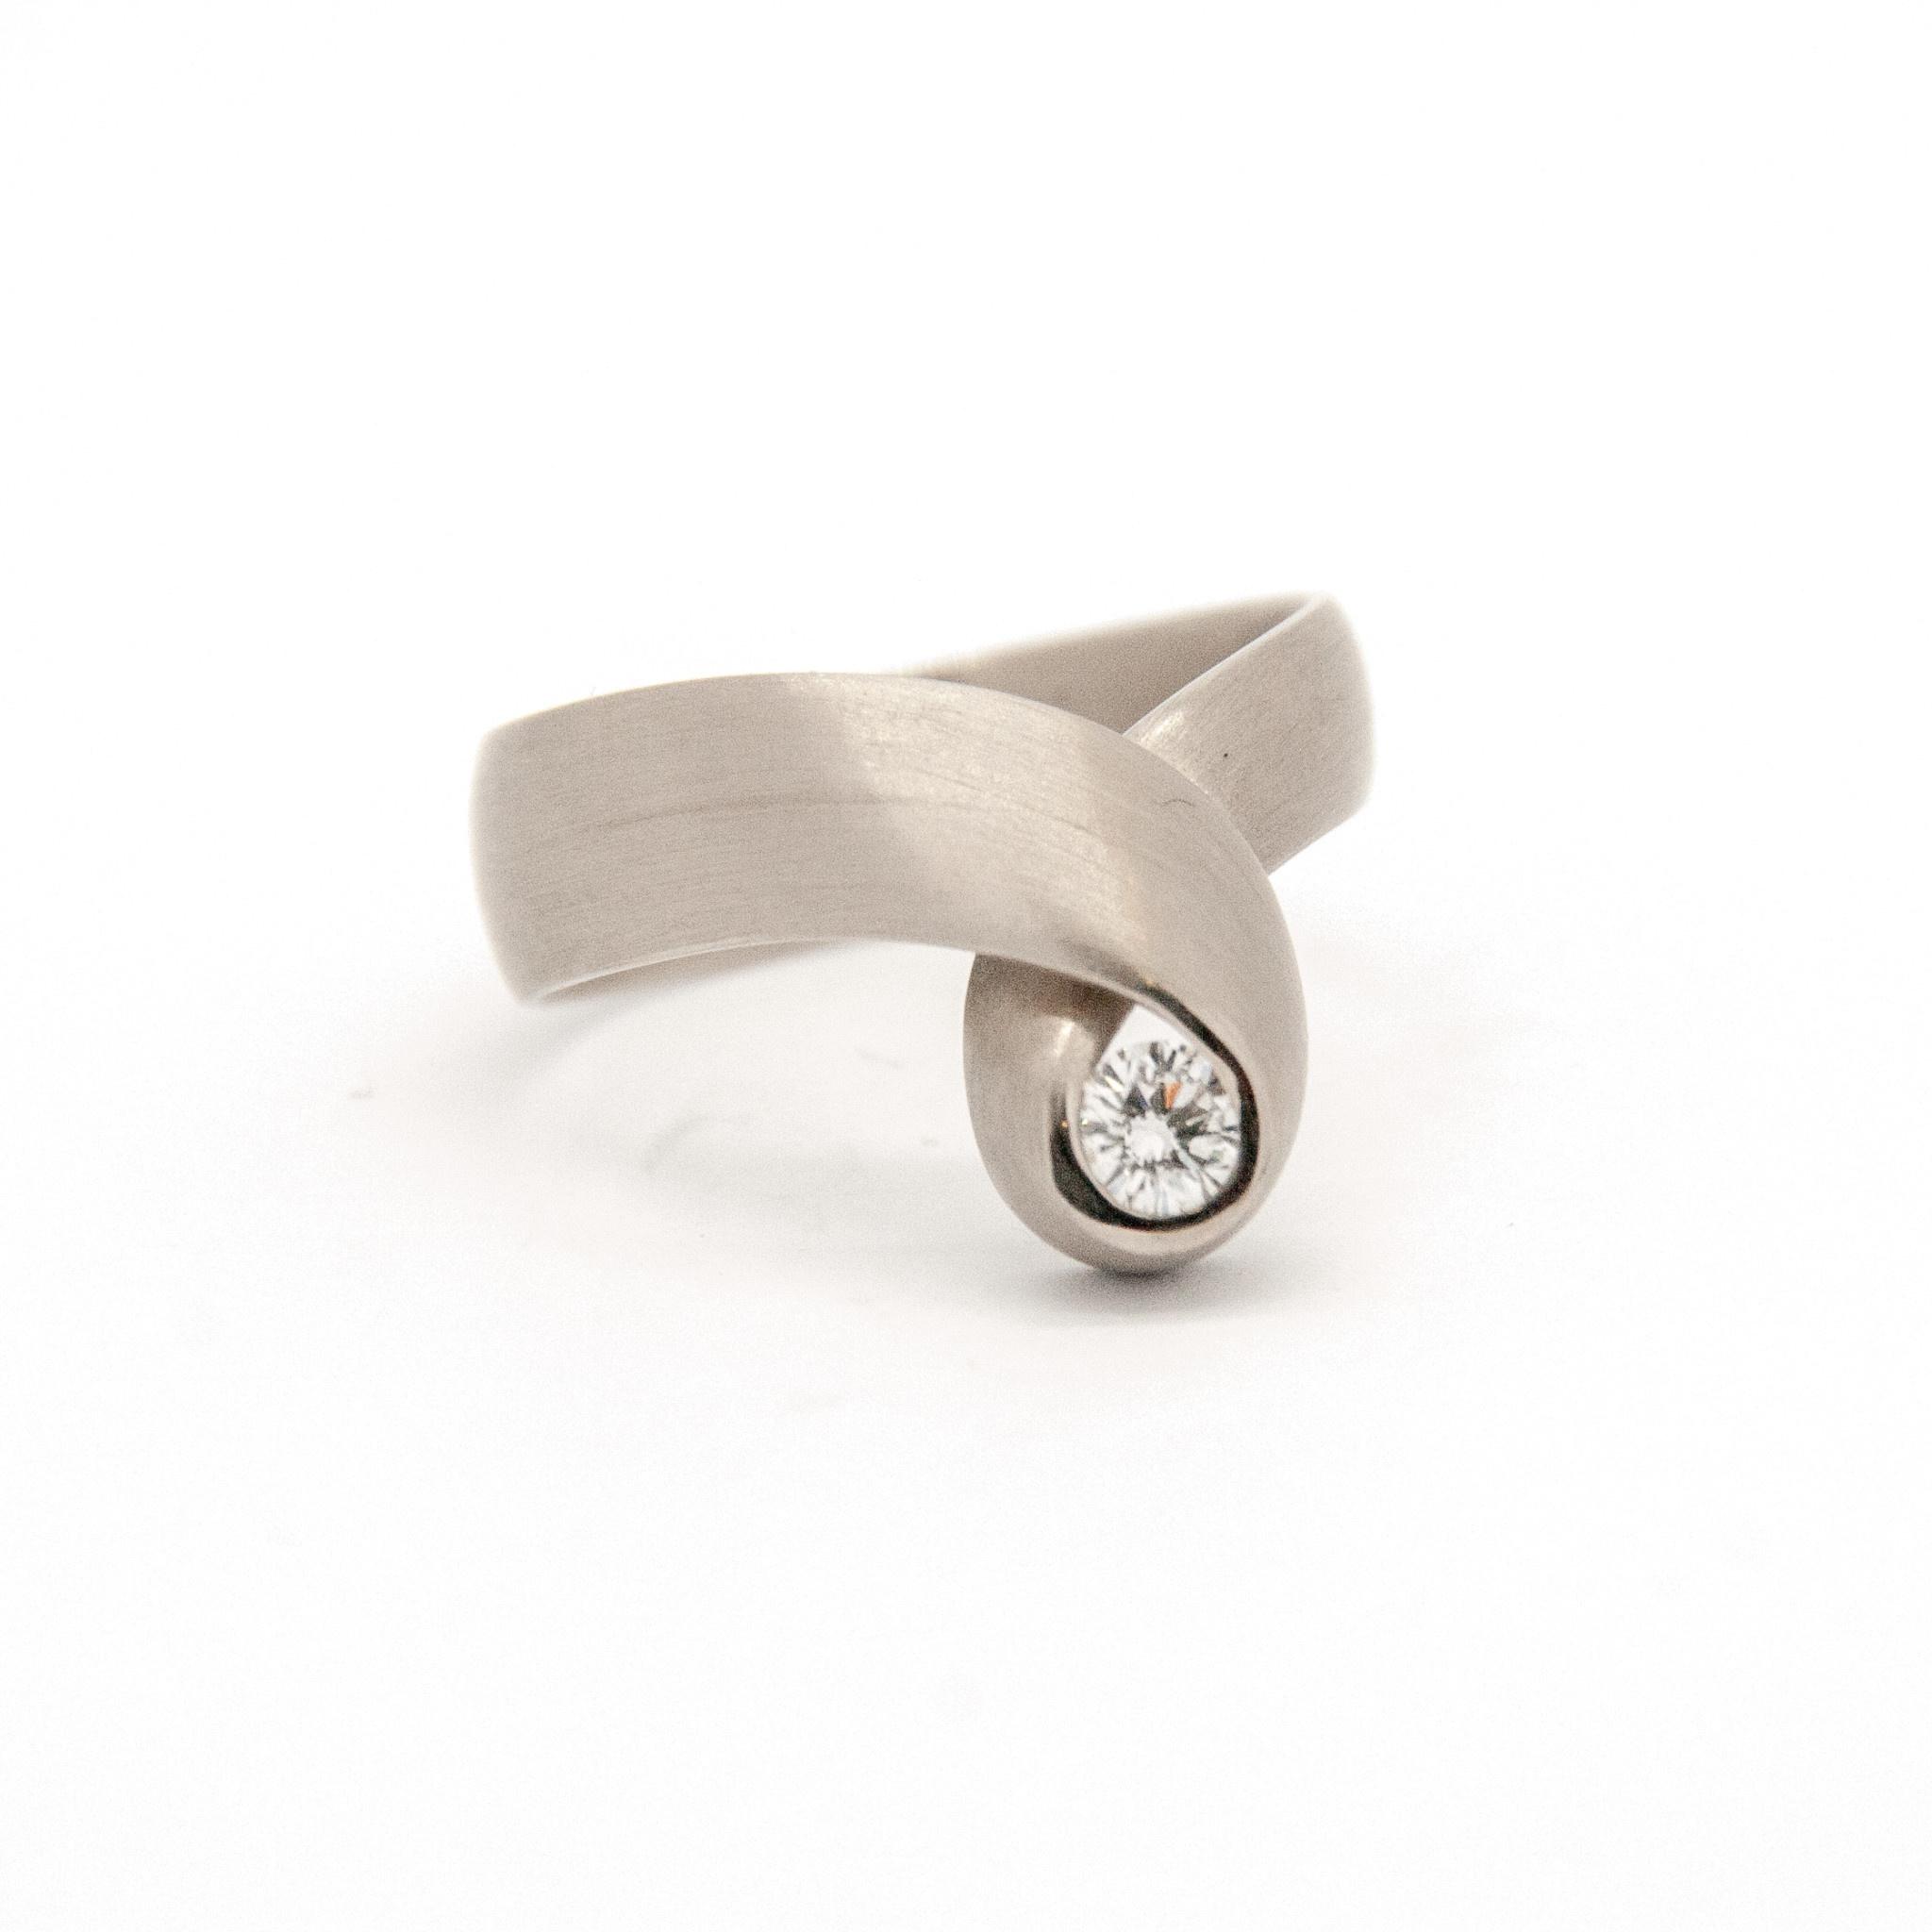 14k white gold ring size 56-12